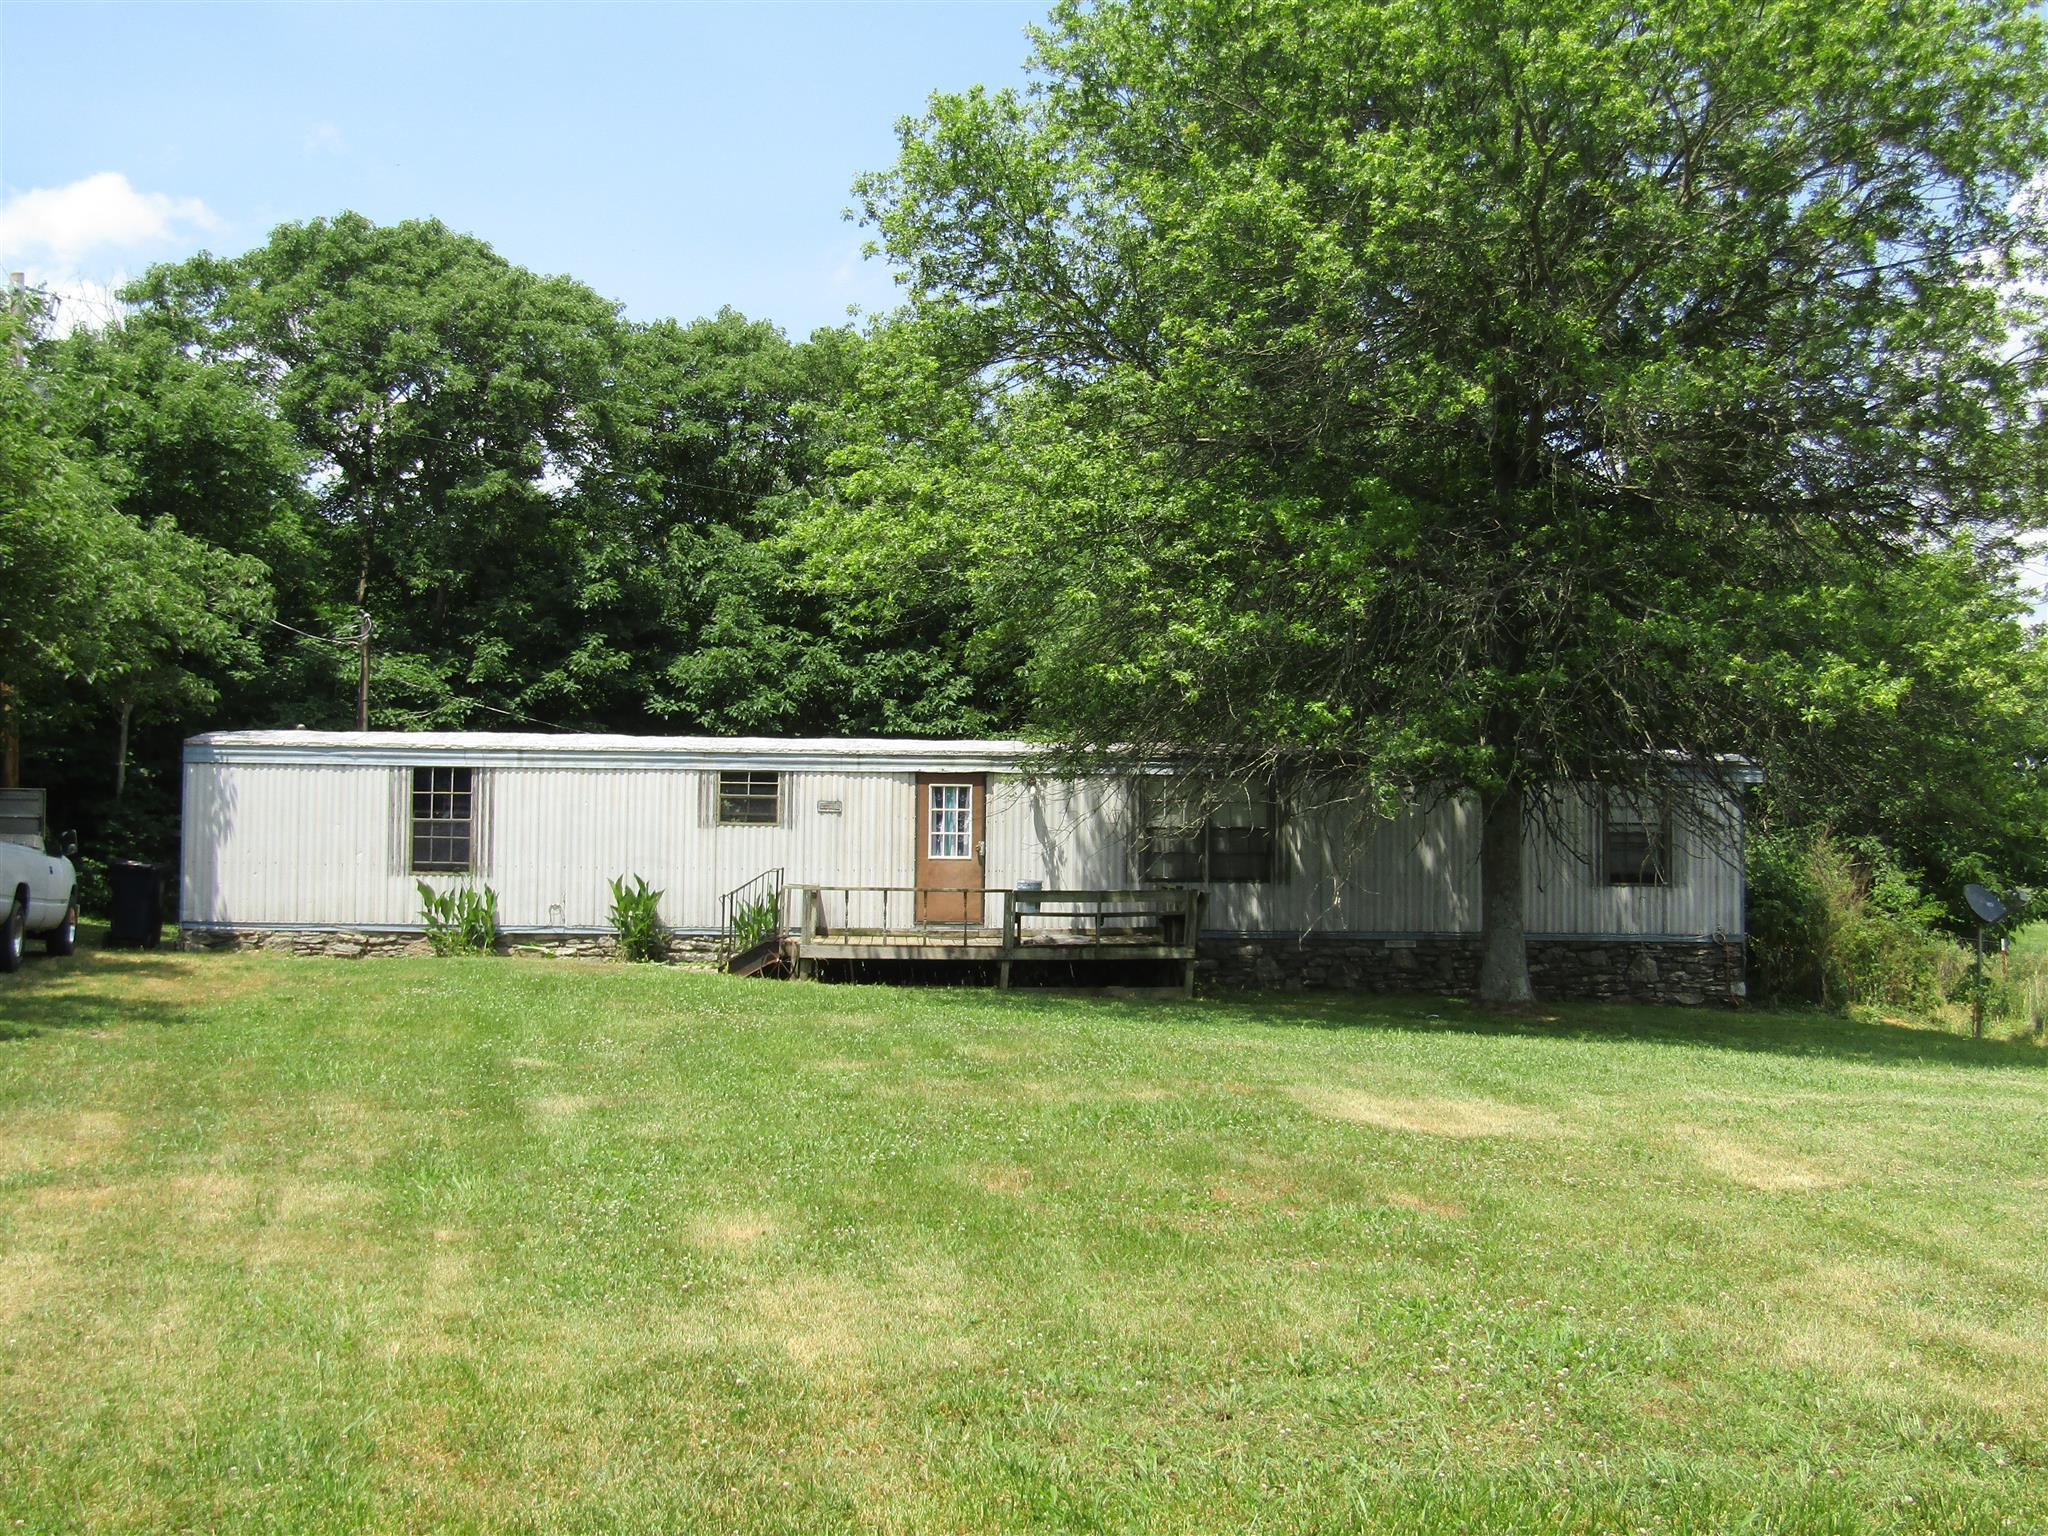 301 Coleman Rd, Cornersville, TN 37047 - Cornersville, TN real estate listing